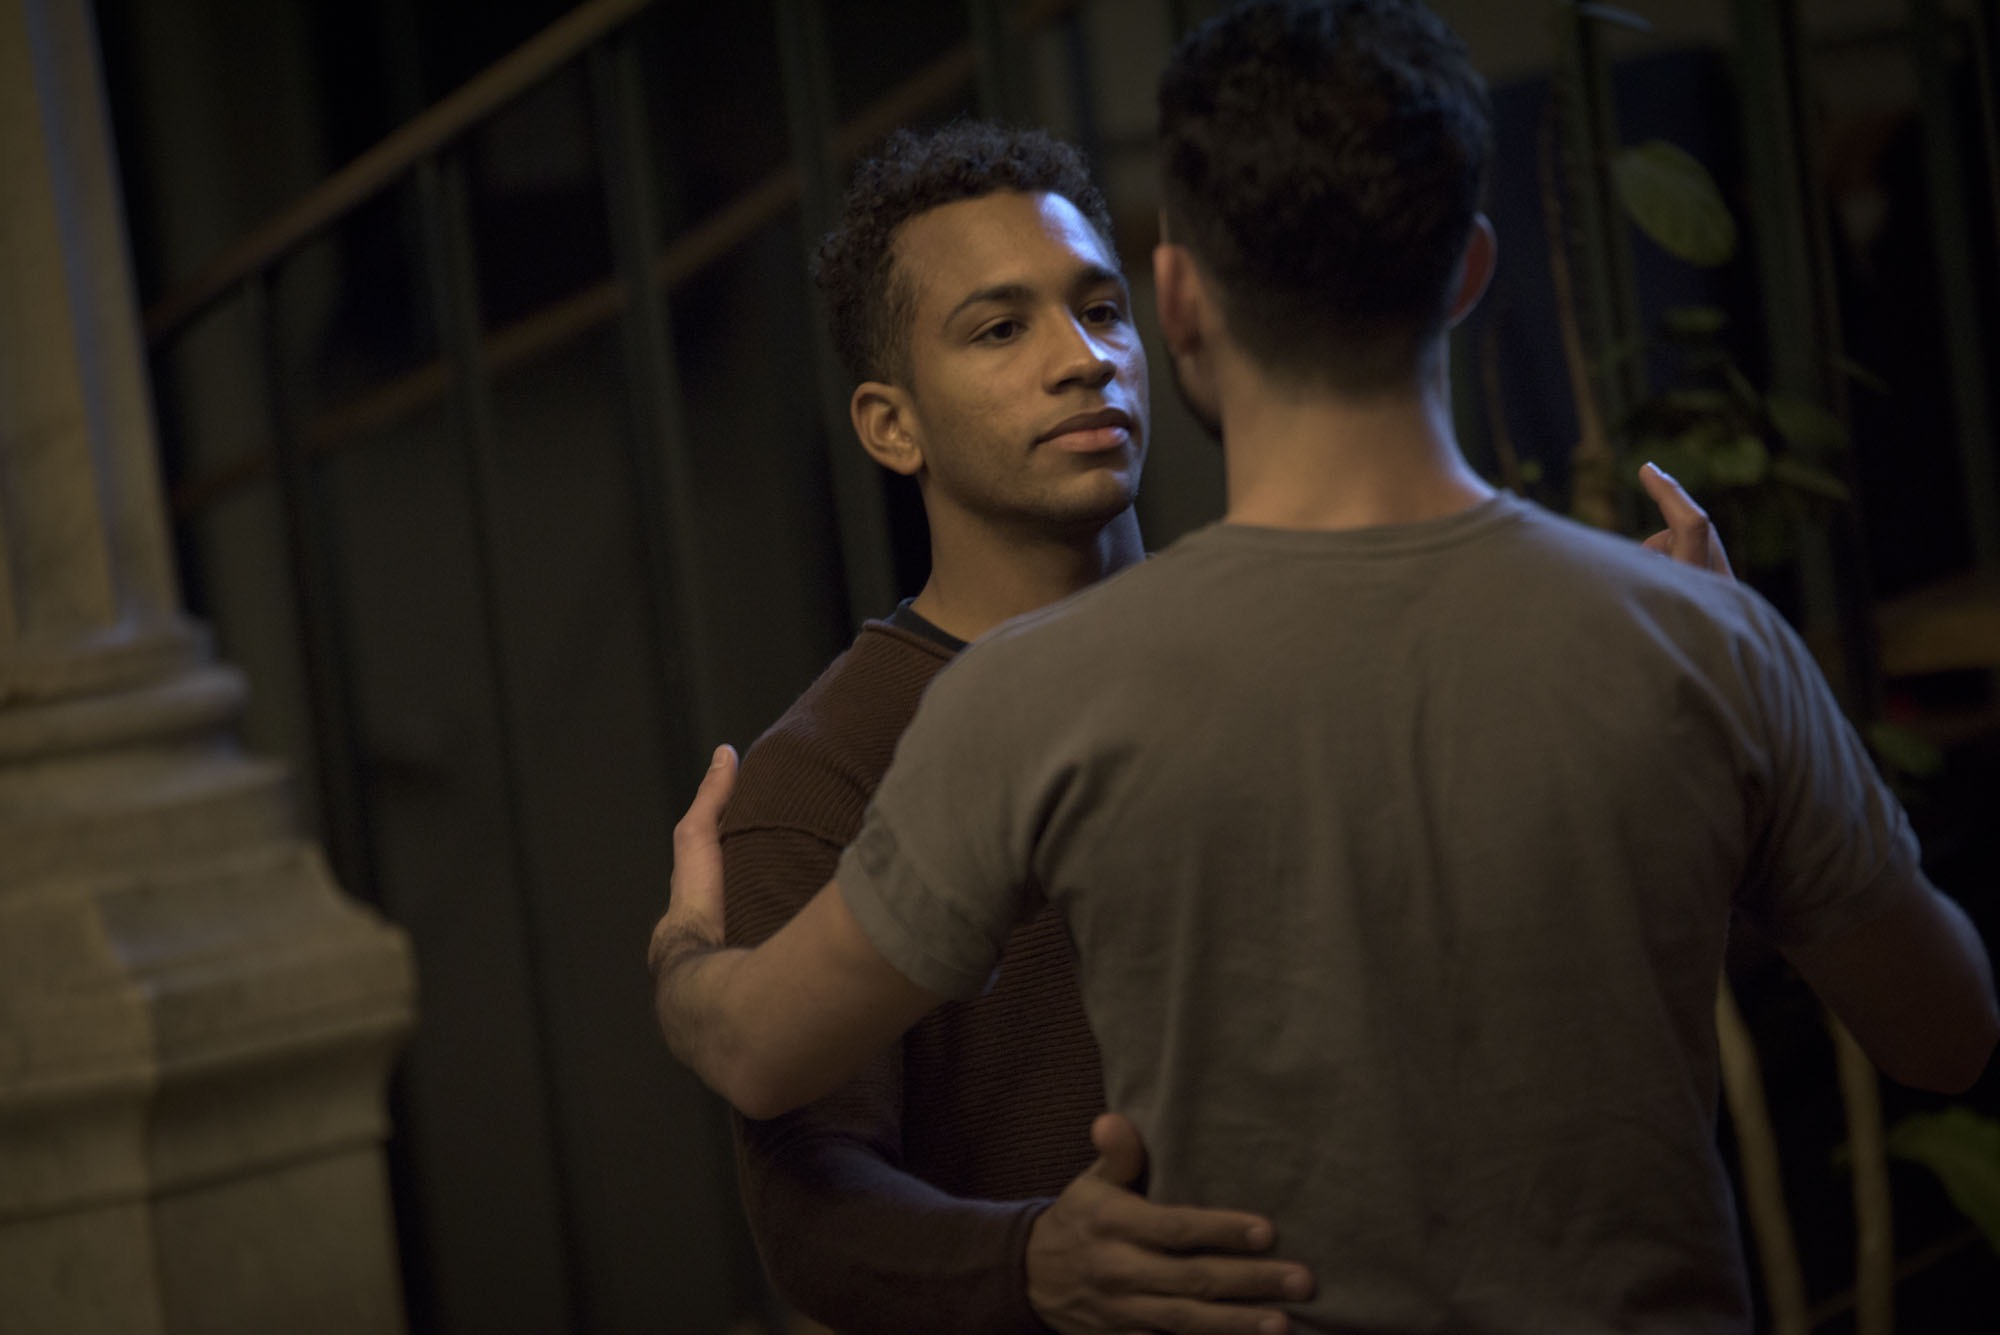 Jonathan Gonzalez Reyes & Wendel Mota 11 ©Frederic Garcia.jpg